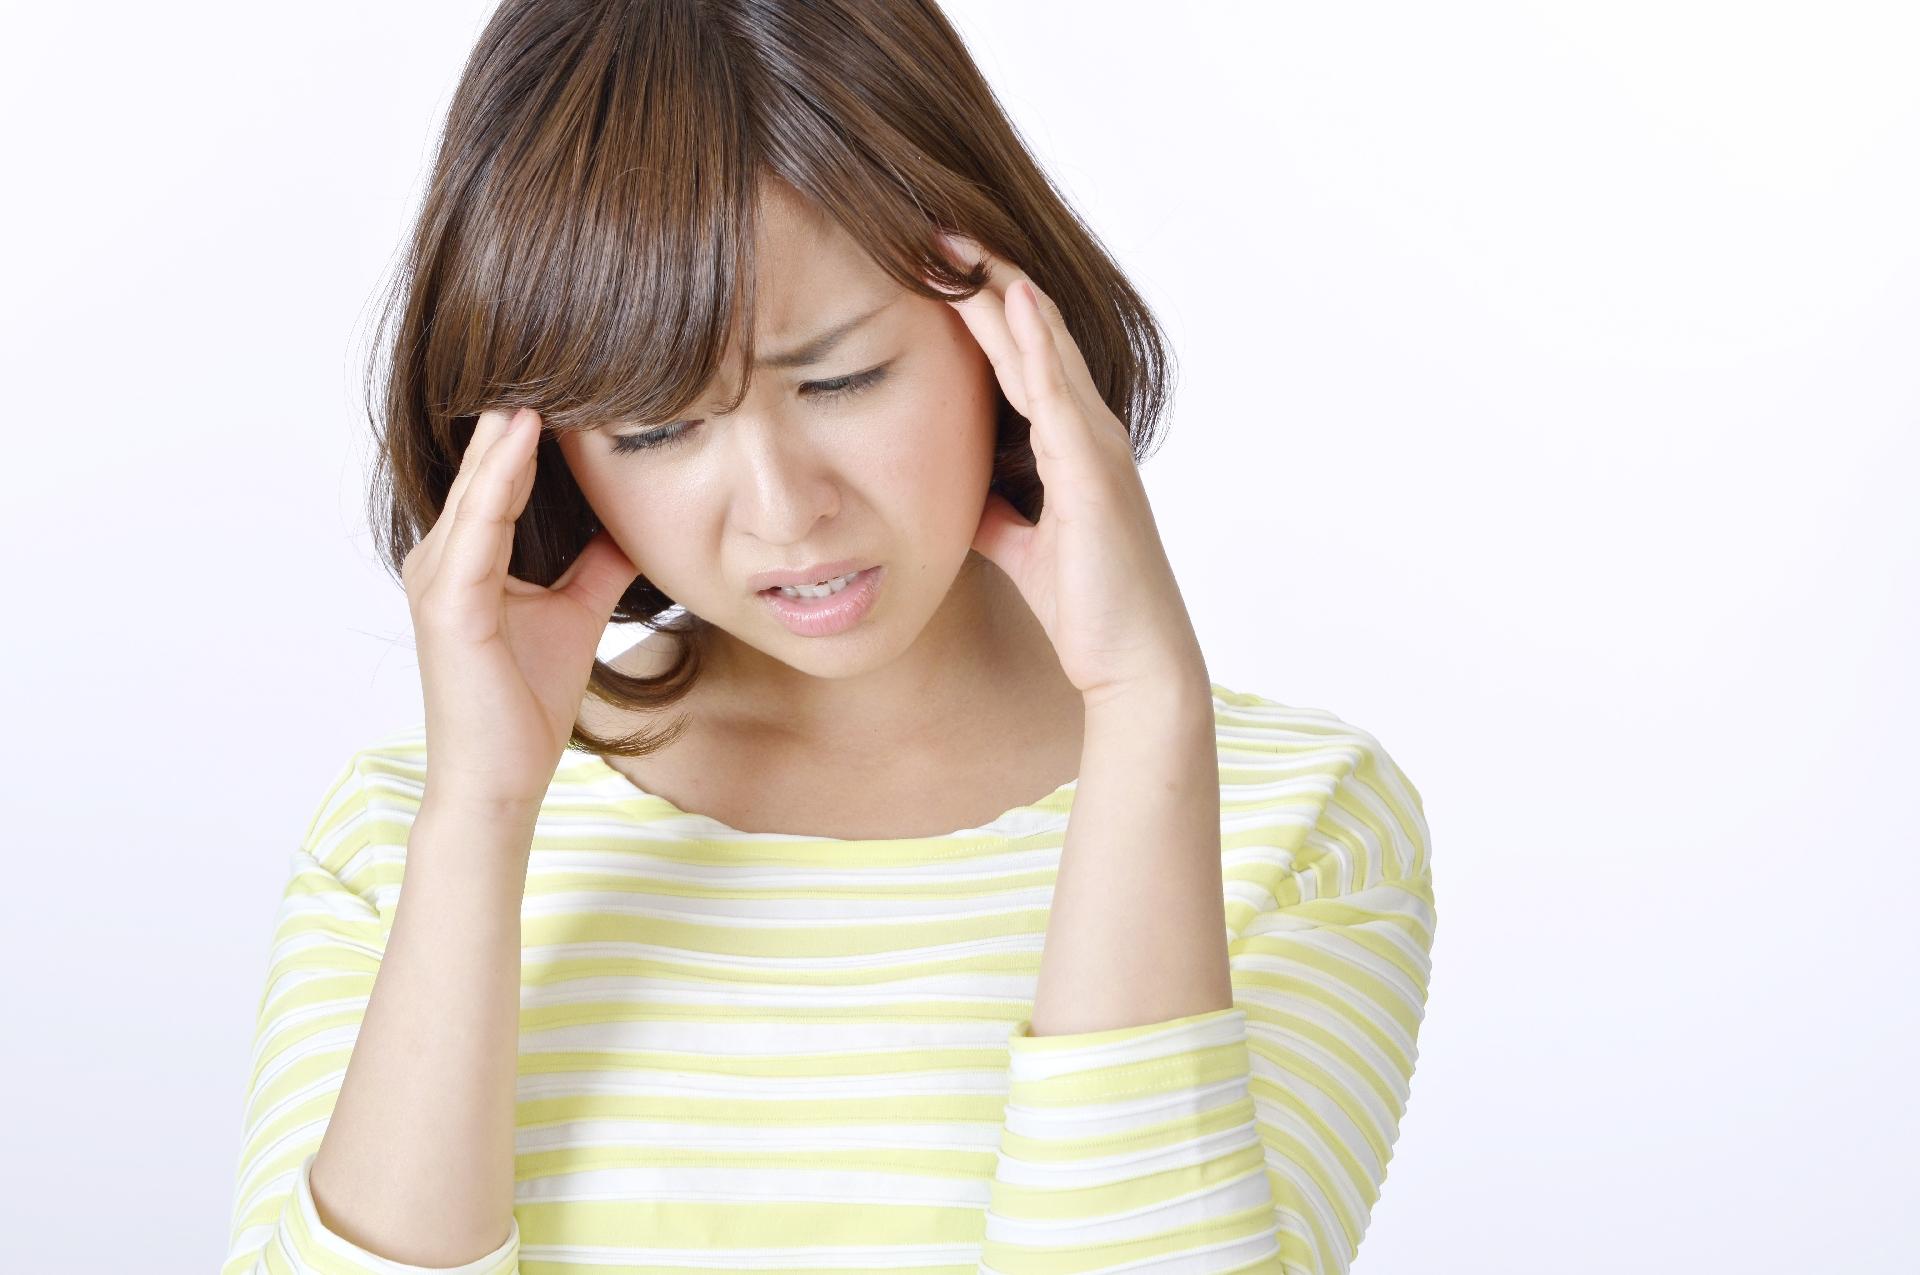 NHKあさイチで「夫の発達障害」特集 妻が孤独を抱えて、うつ病を発症し…